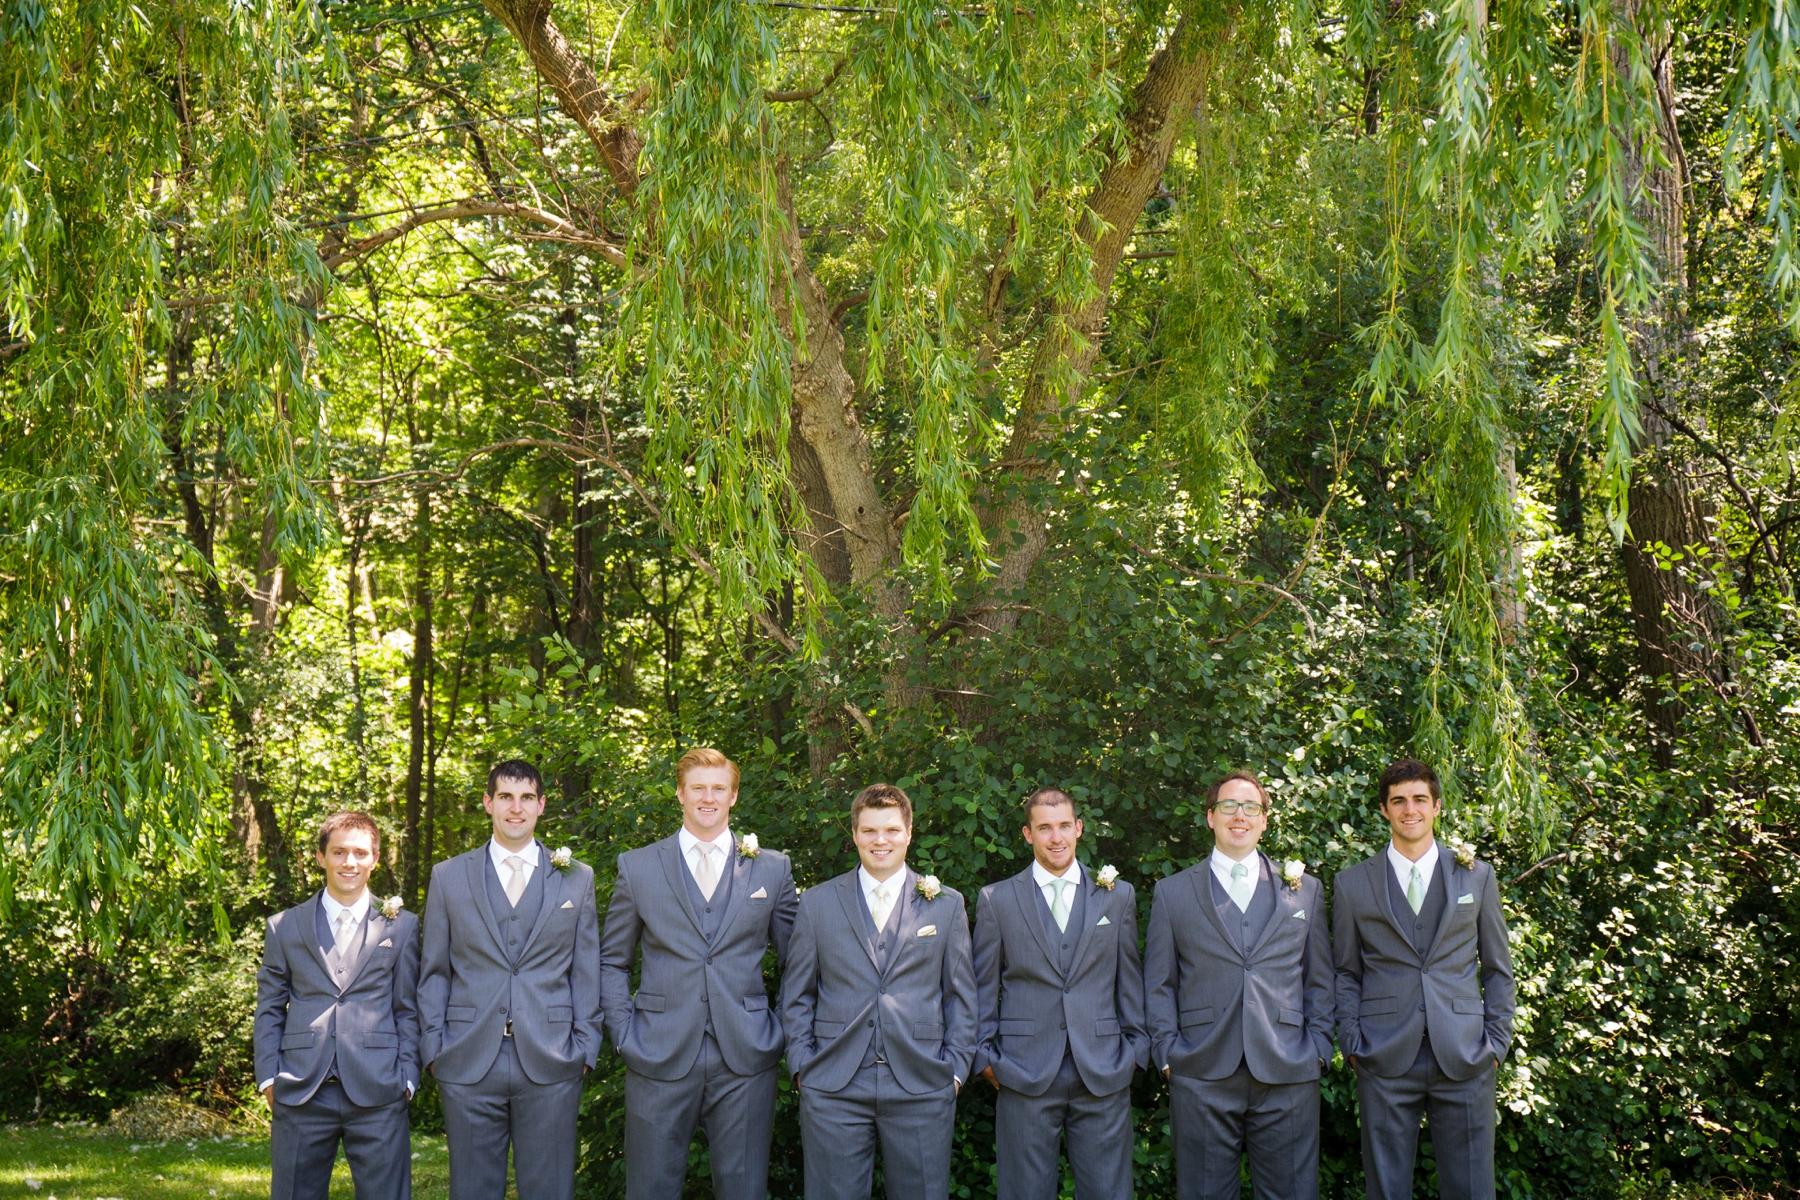 Ben_Jillian_Midland_Baycity_Wedding_0019.jpg